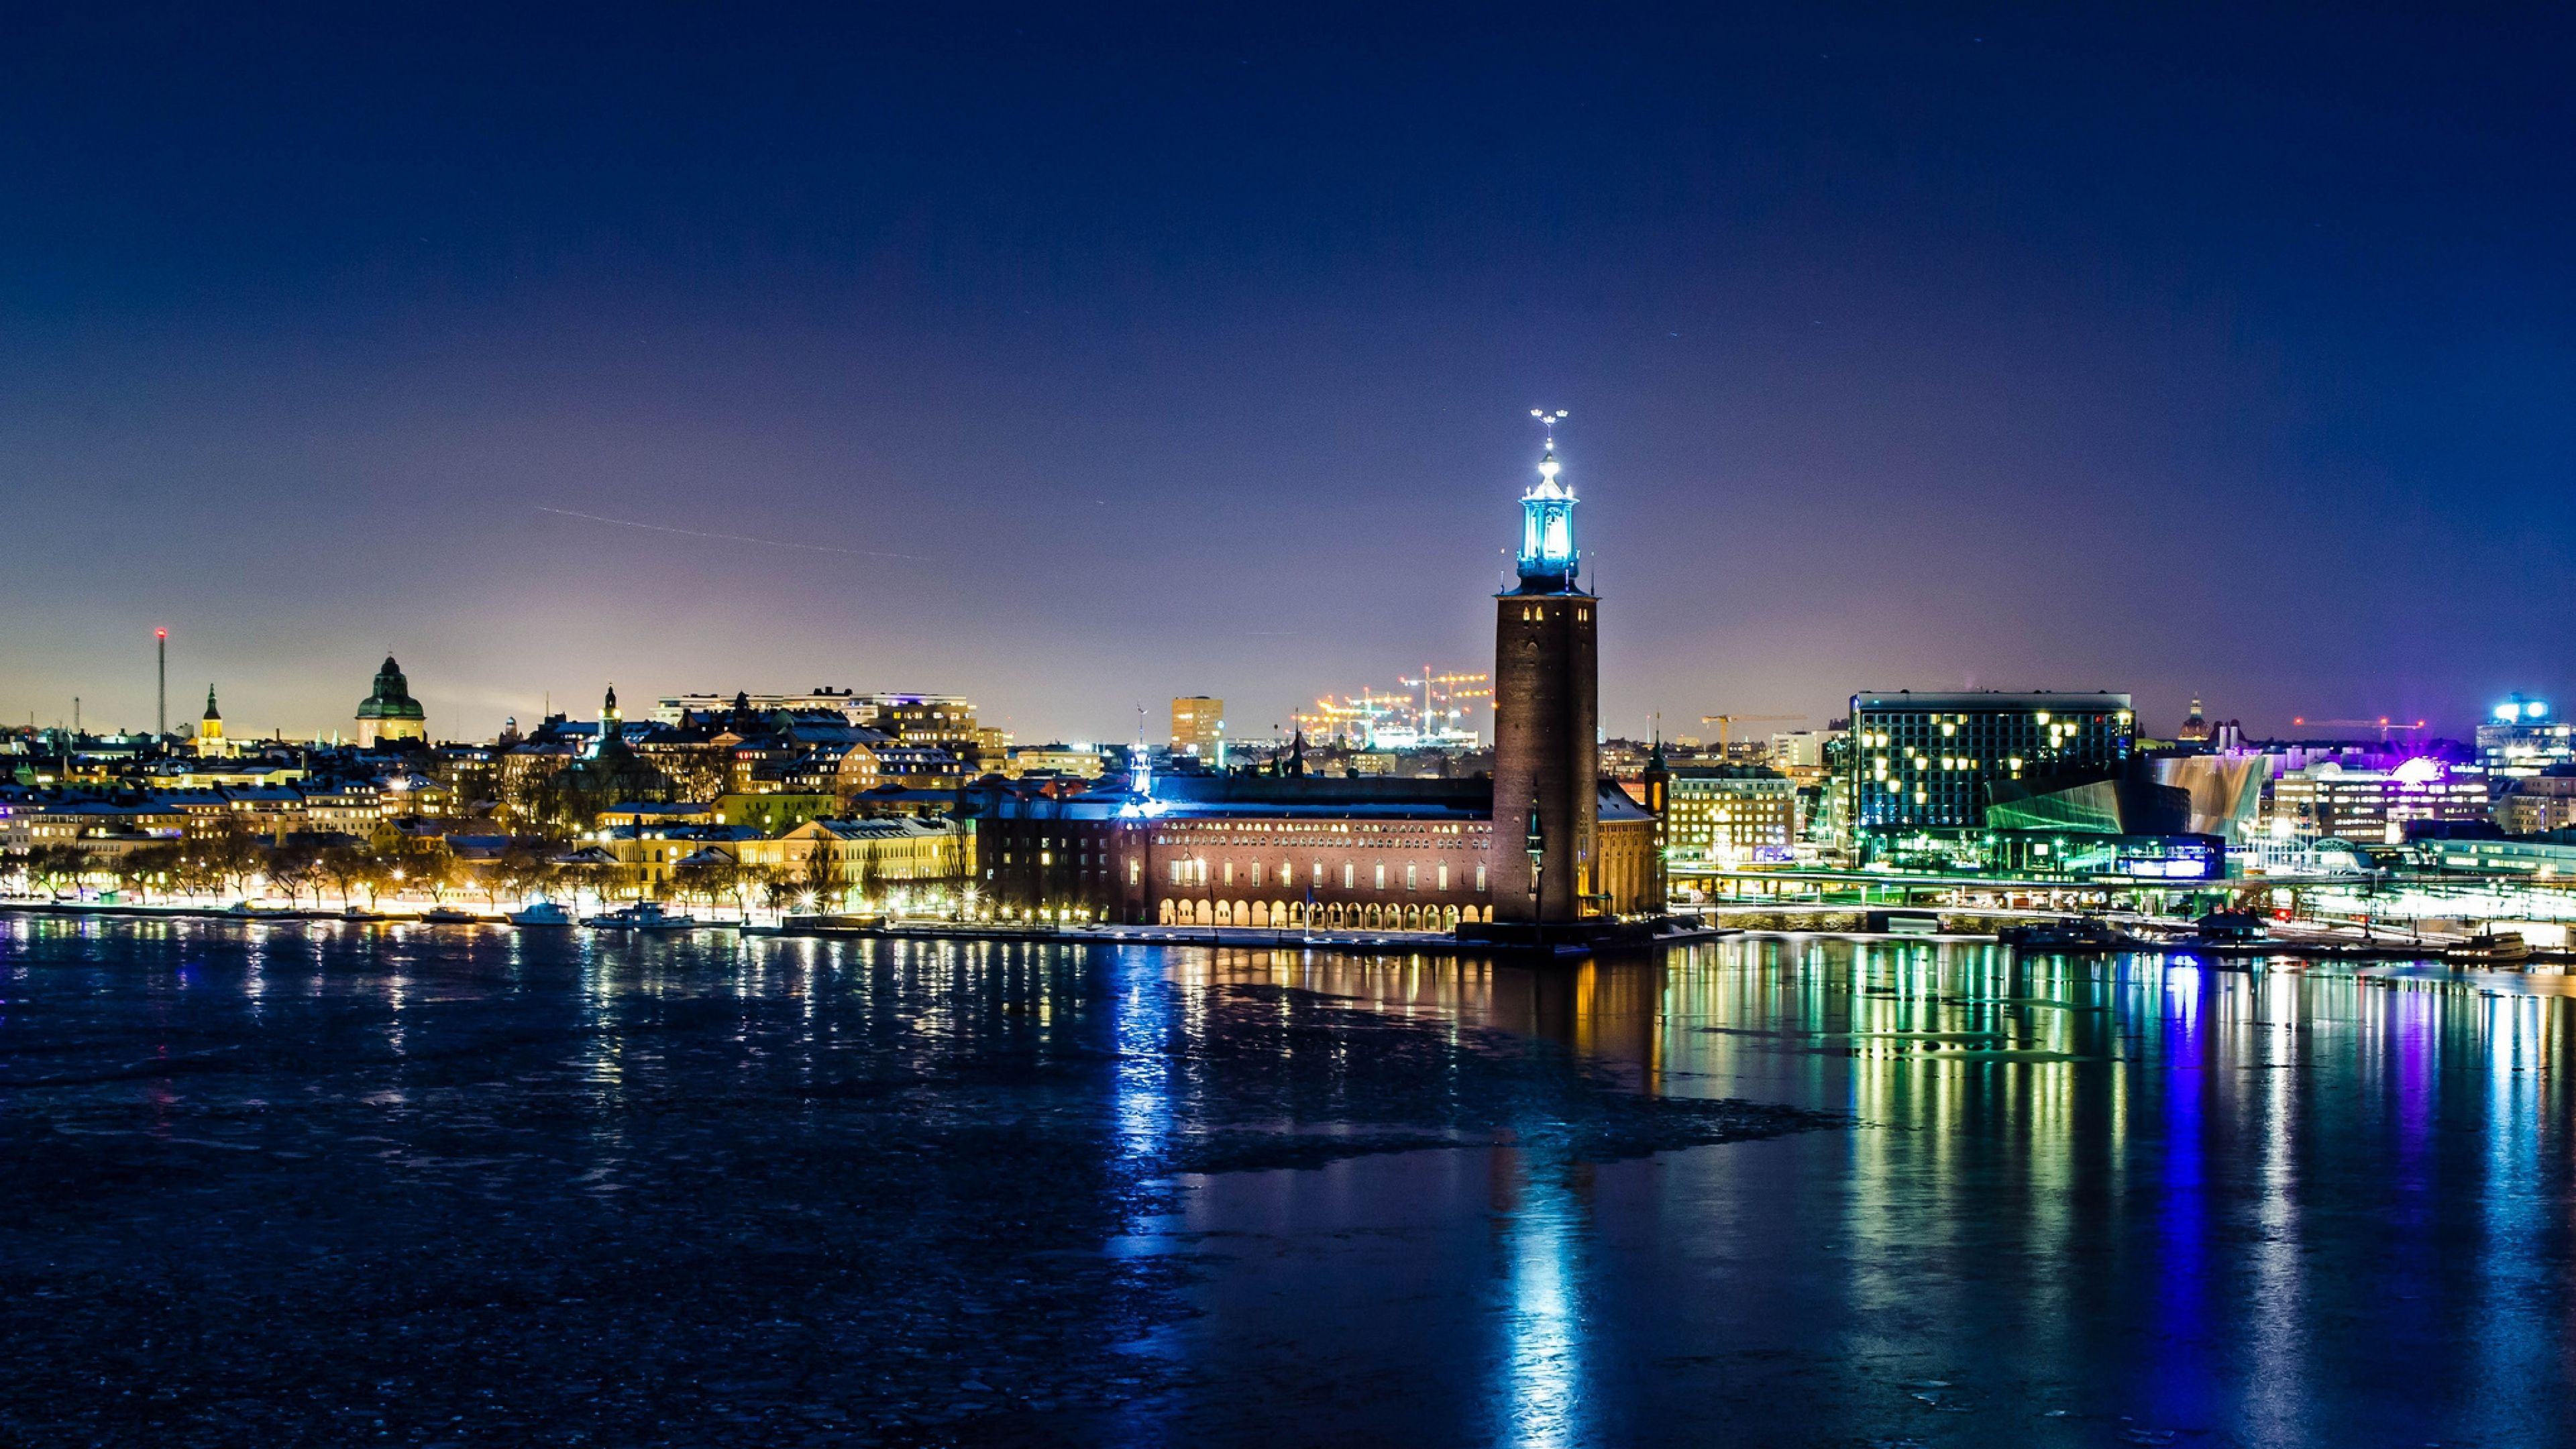 3840x2160 Wallpaper Sweden Stockholm Winter Night City Hall Lights Reflection Seni